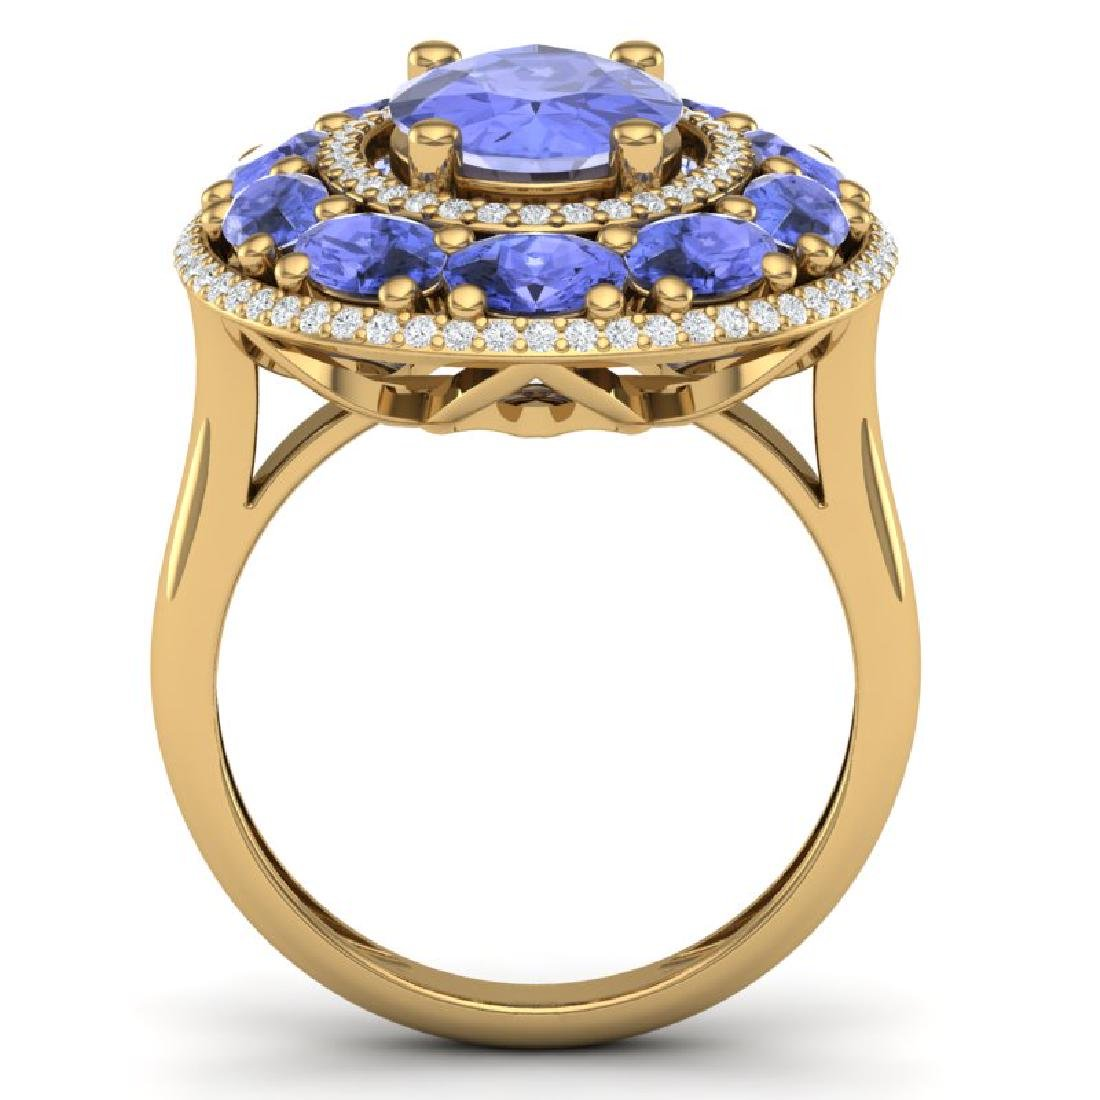 8.49 CTW Royalty Tanzanite & VS Diamond Ring 18K Yellow - 3